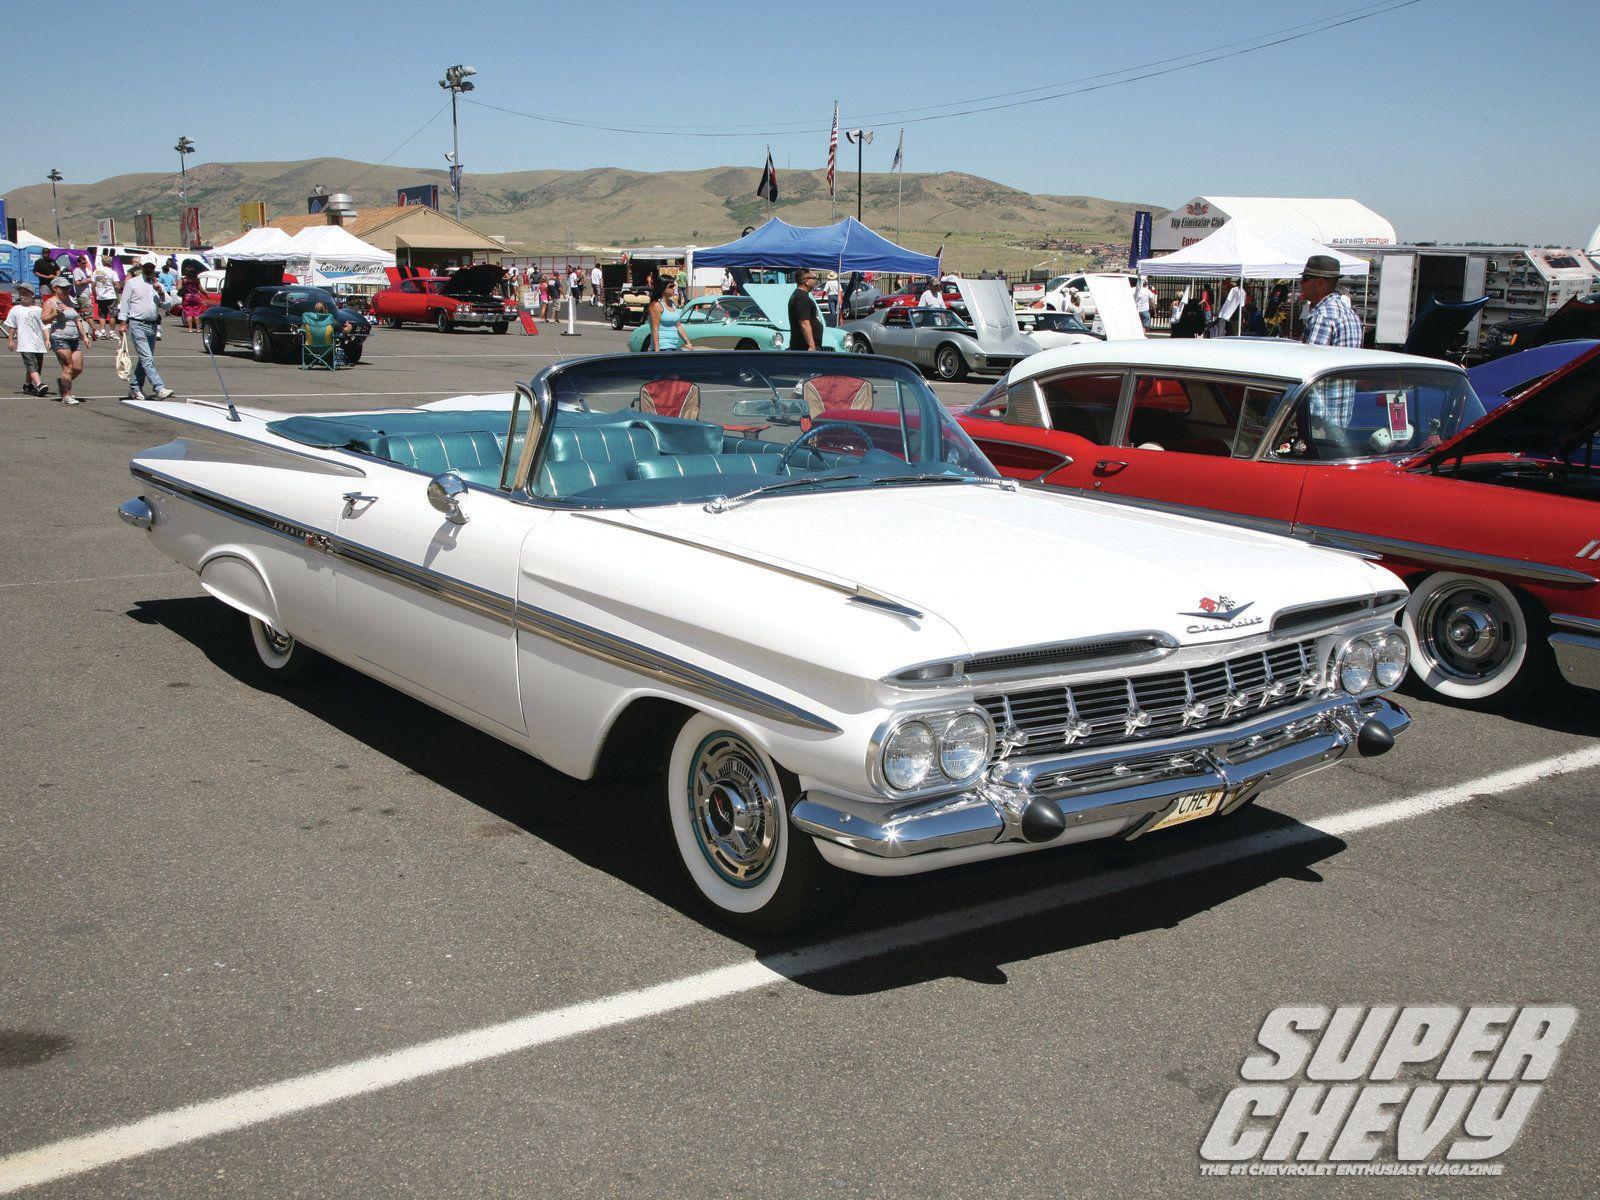 super chevy show denver 59 impala convertible photo 25 1959 chevy impala pinterest. Black Bedroom Furniture Sets. Home Design Ideas